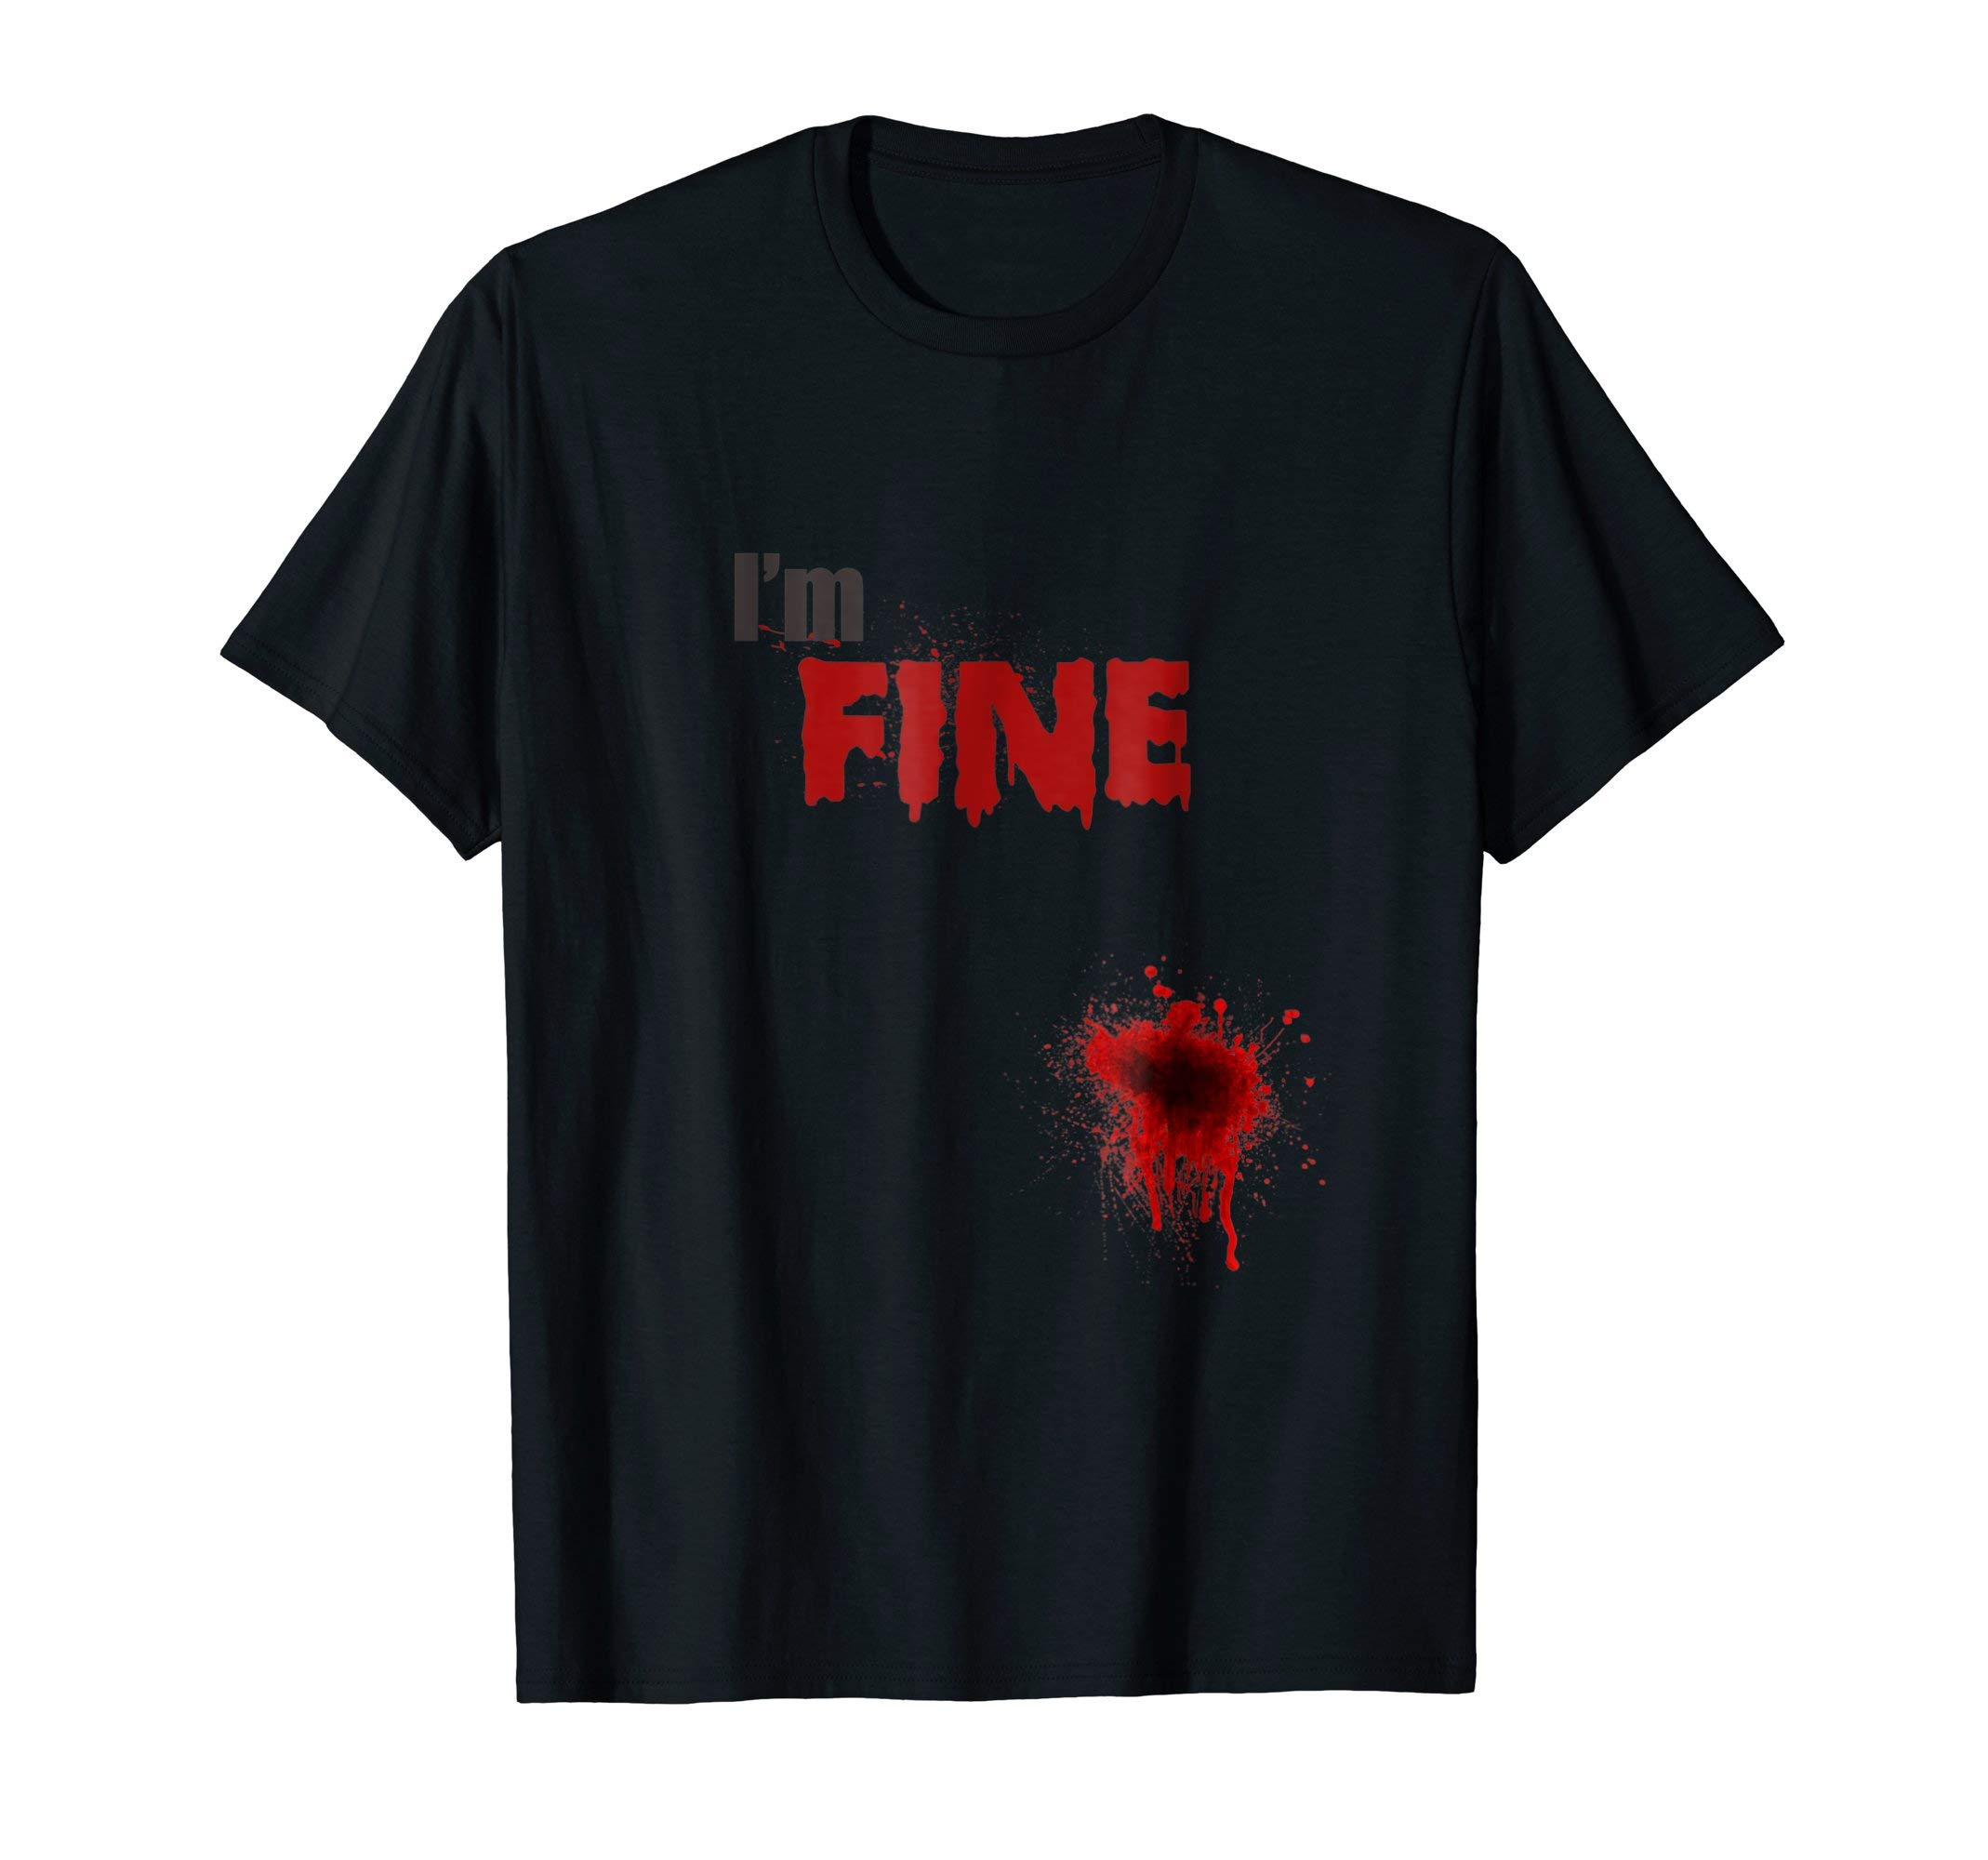 Bloody scary I'm fine halloween T-shirt for men, women, kids